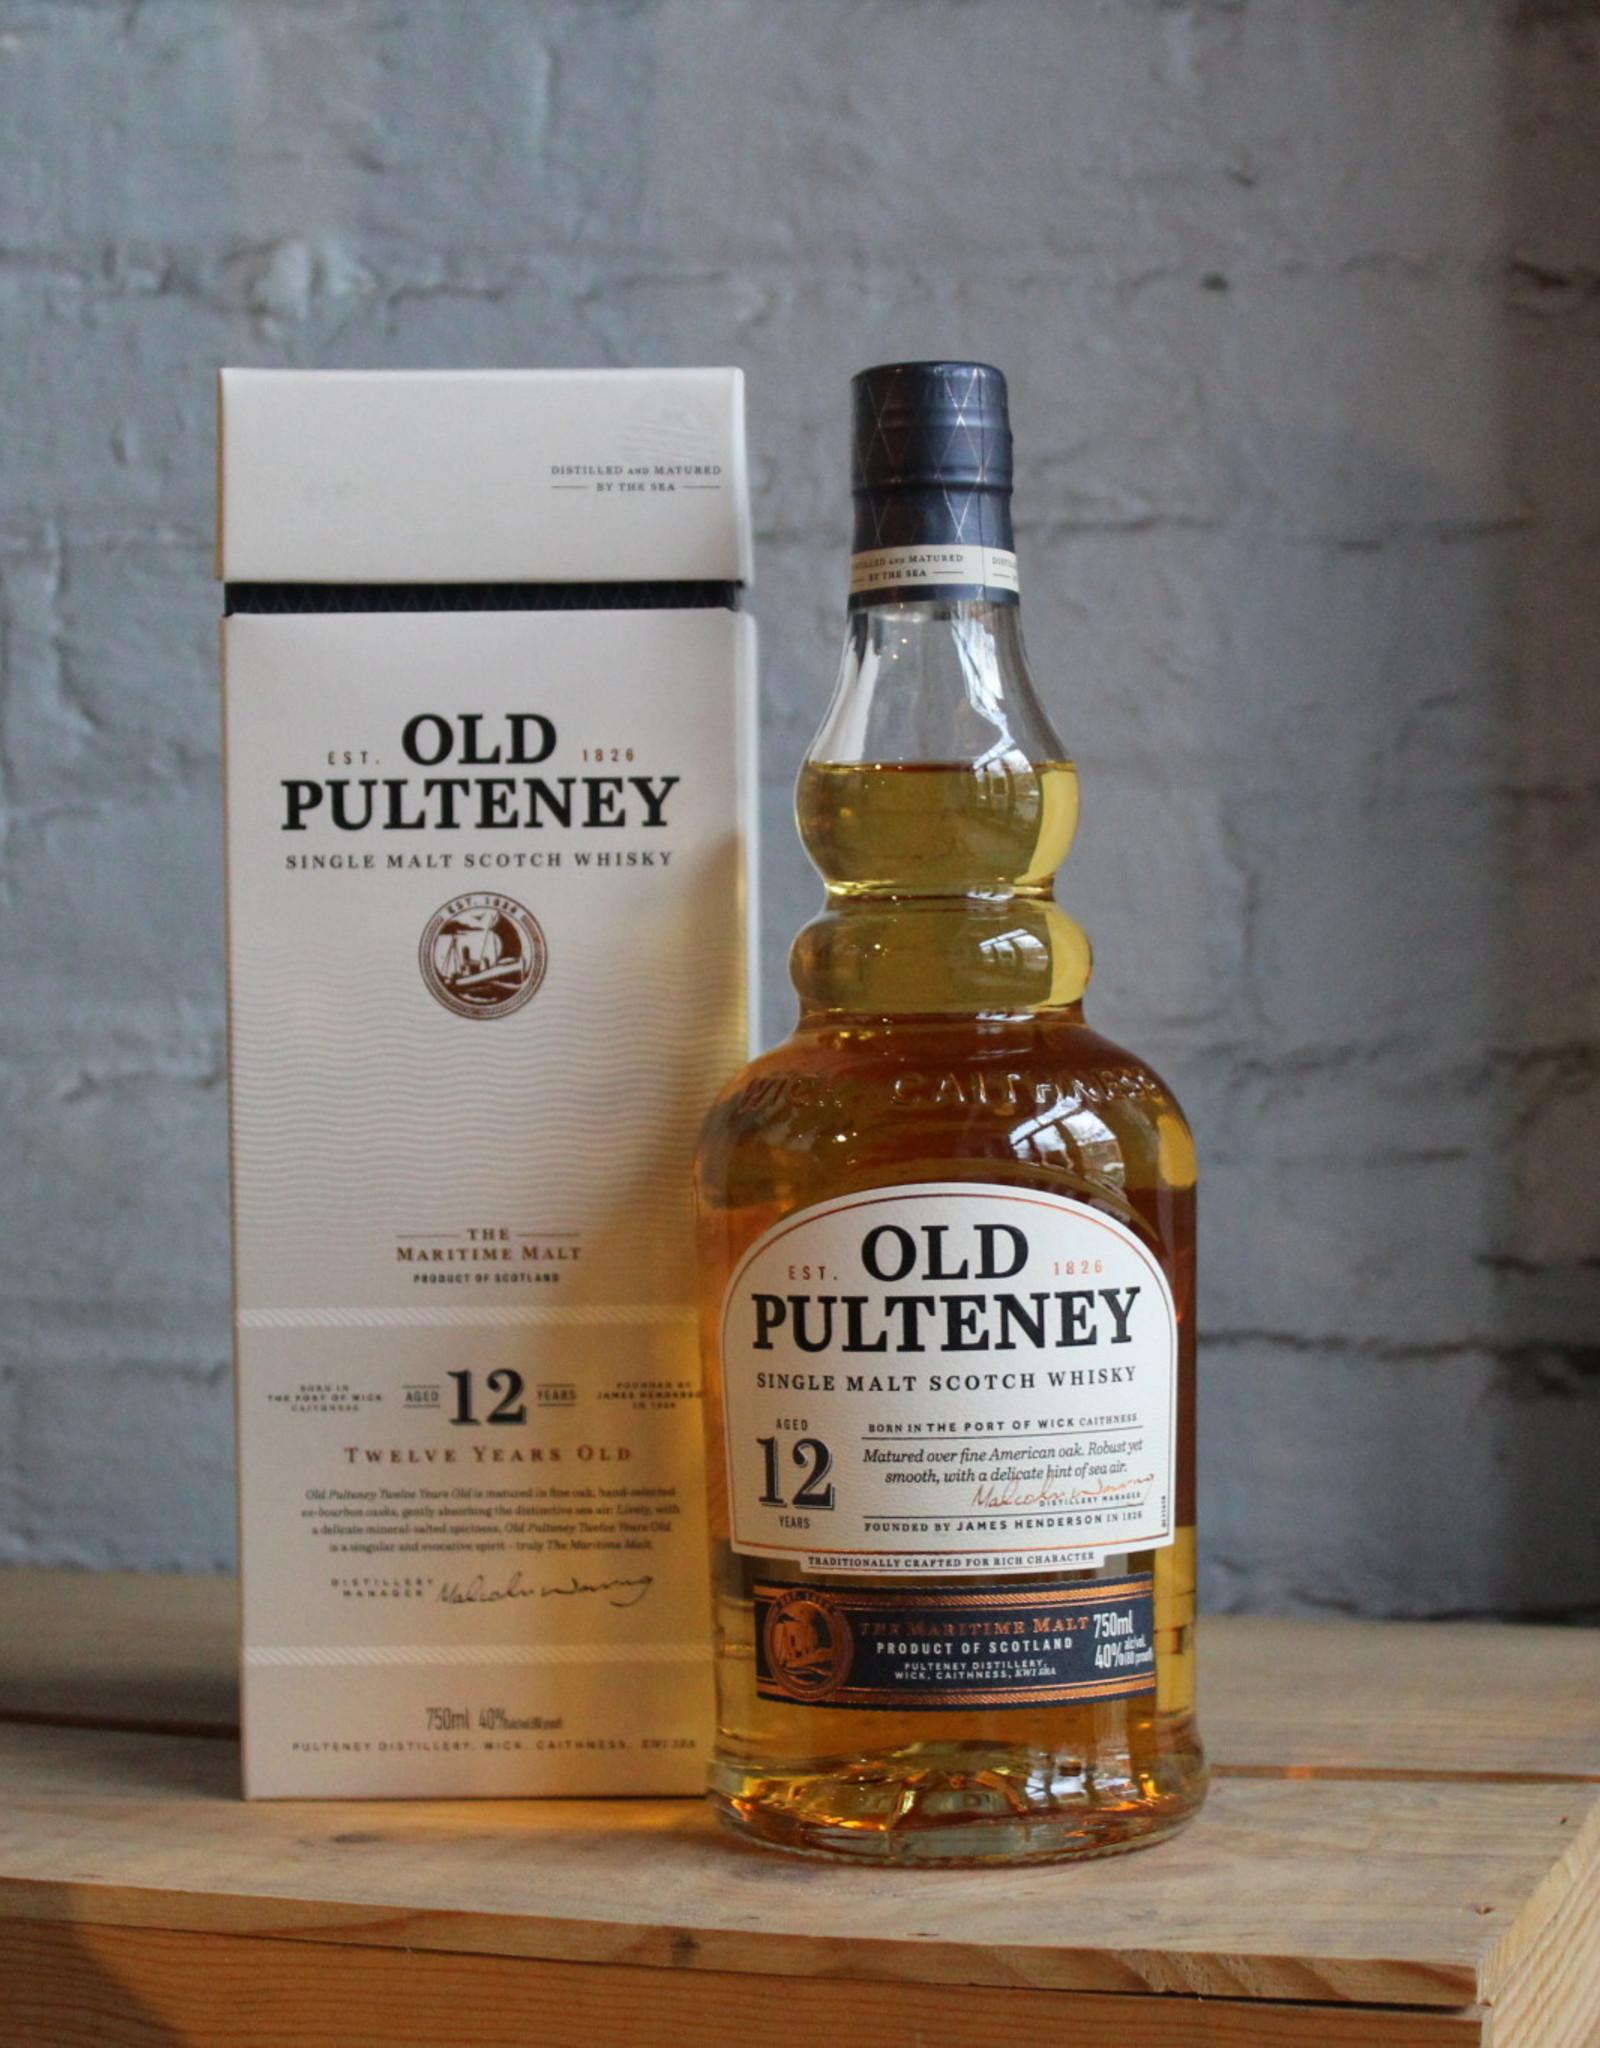 Old Pulteney 12yr Single Malt Scotch - Wick, Highlands, Scotland (750ml)